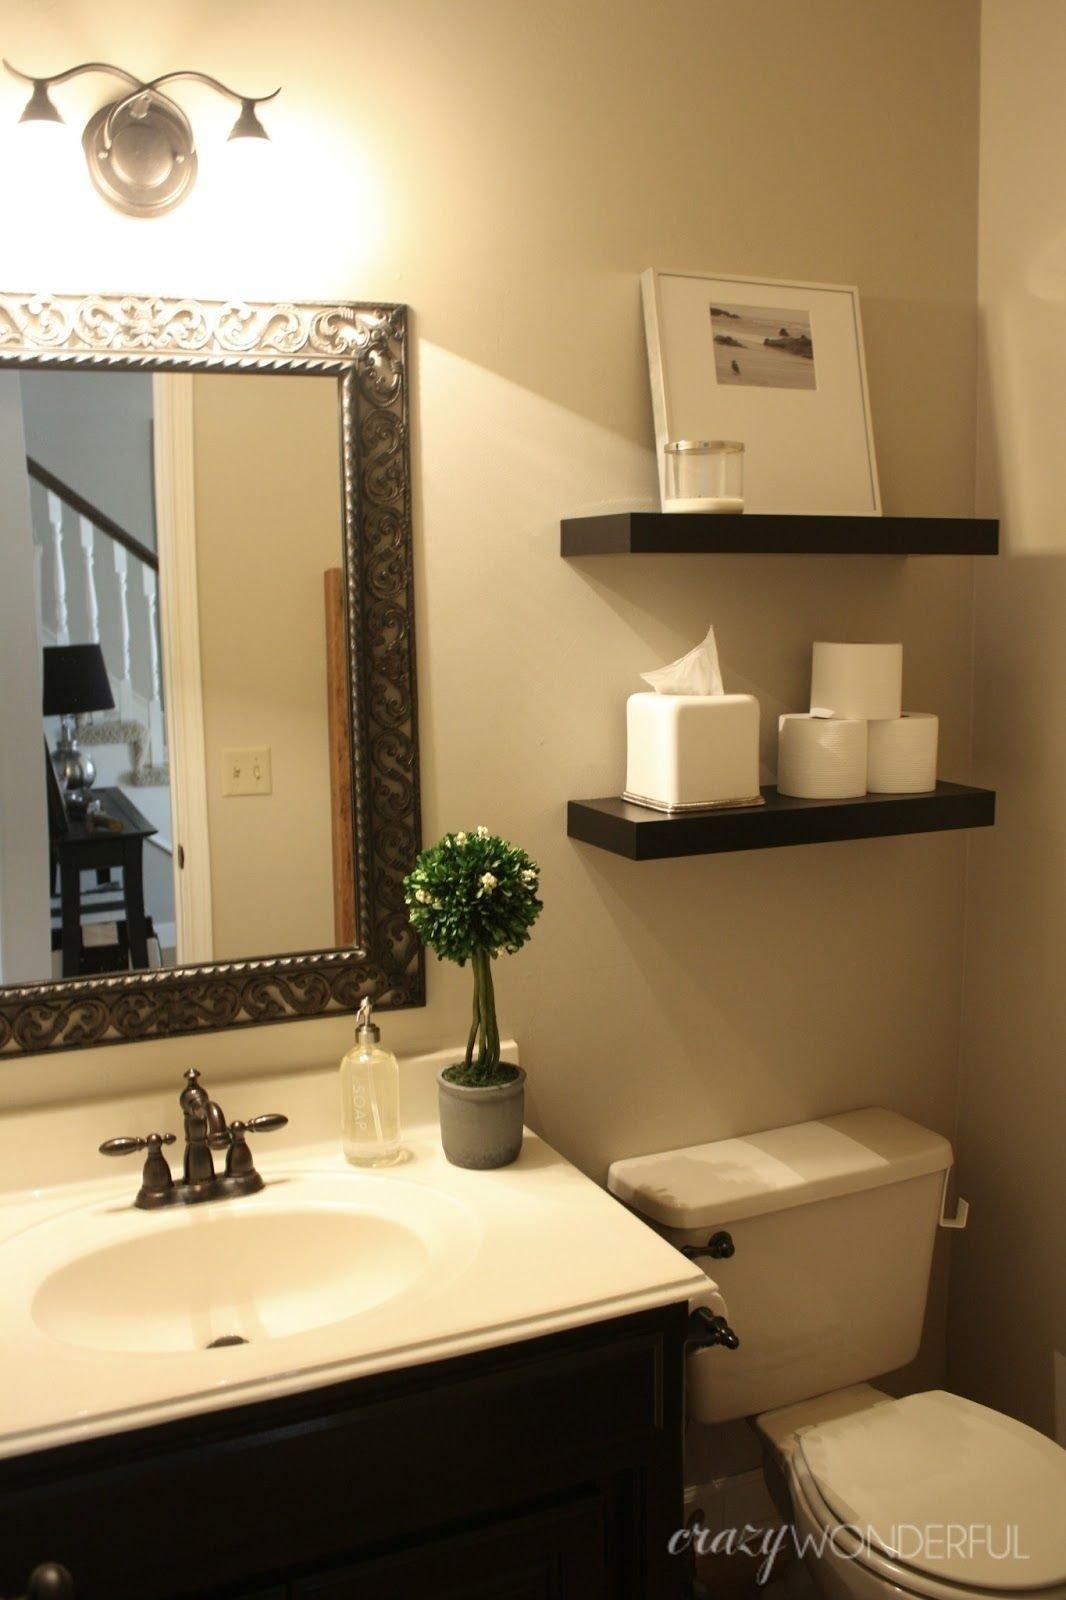 10 Ideal Small Powder Room Decorating Ideas interior unique brown wooden cabinet white ceramic toilet small 2020